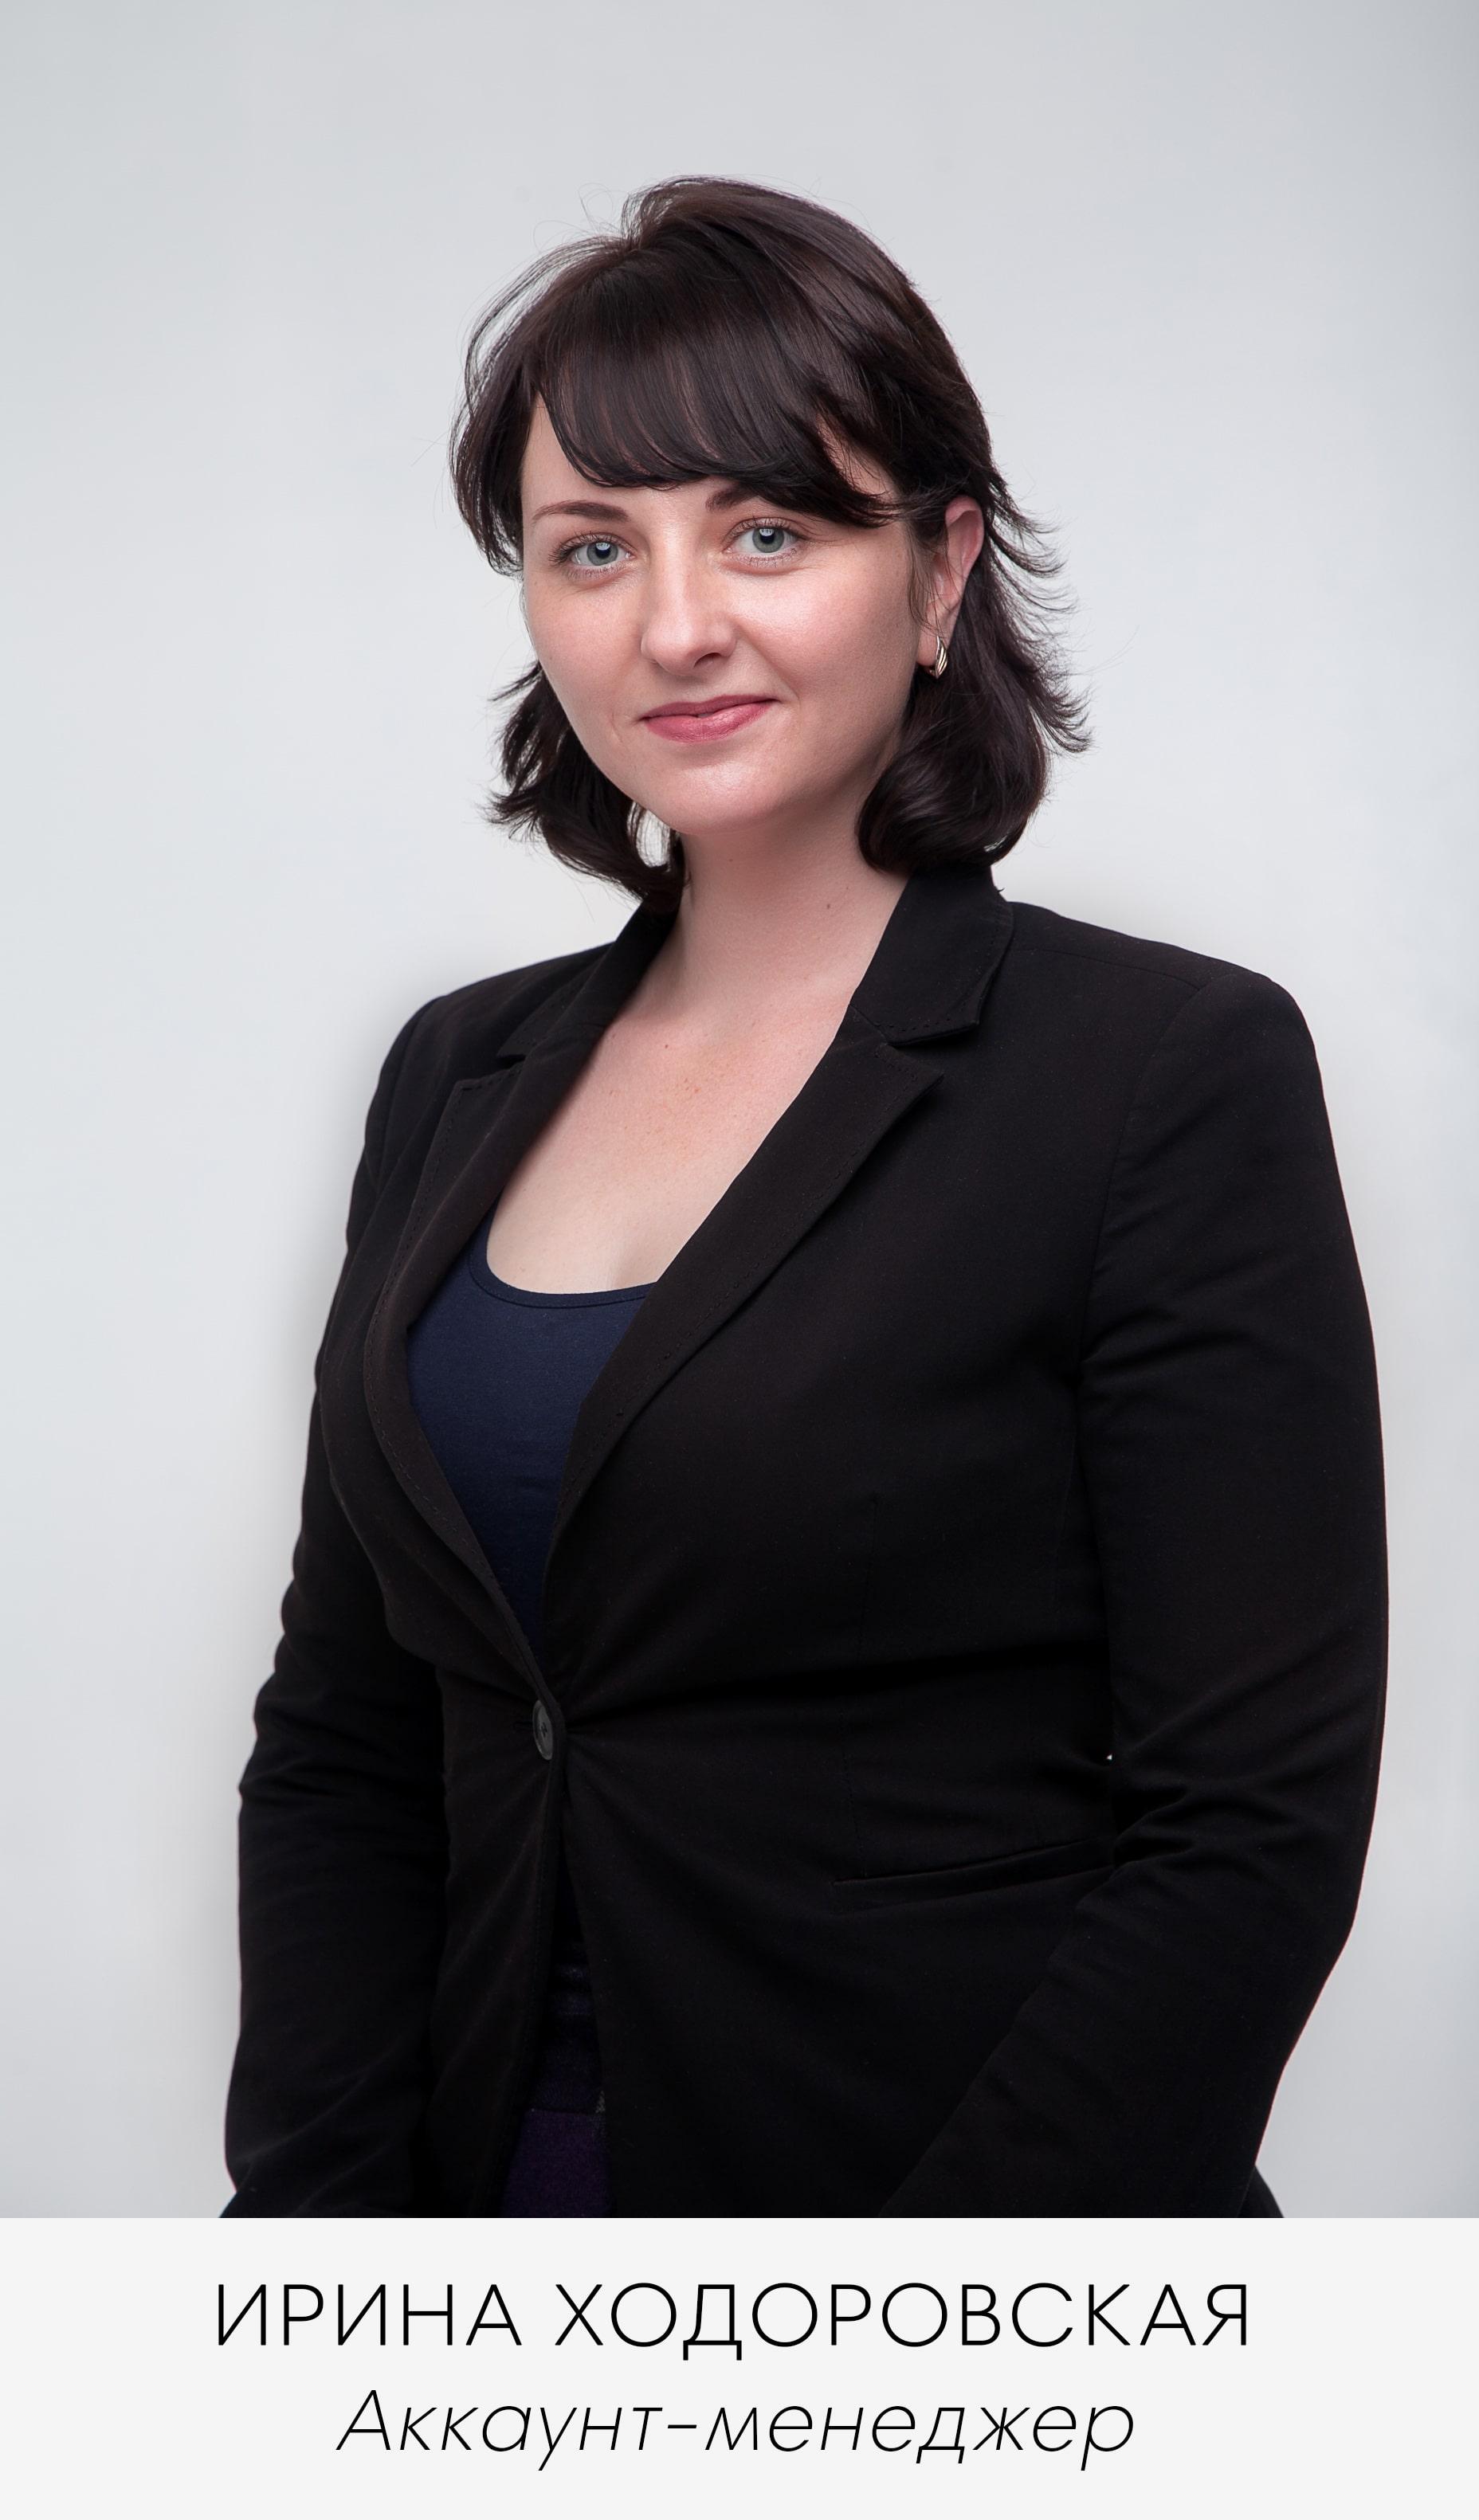 Irina-Hodorovskaya-account-manager-1-min.jpg